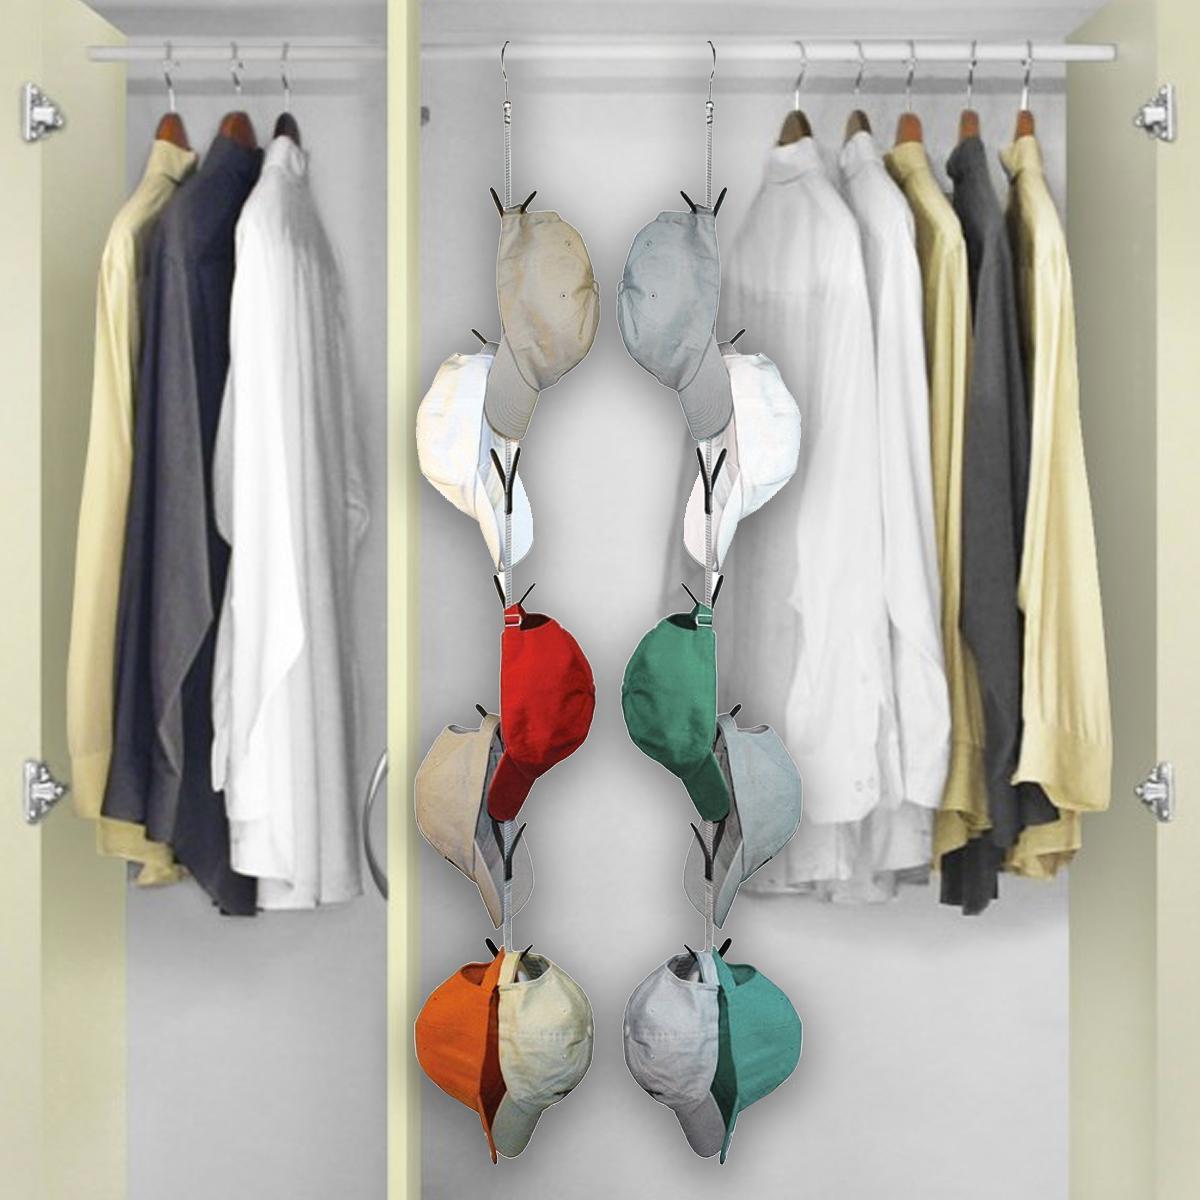 2 Hanging Cap Keeper Racks Hats Ties Belts Holders Closet Hook Storage Organizer